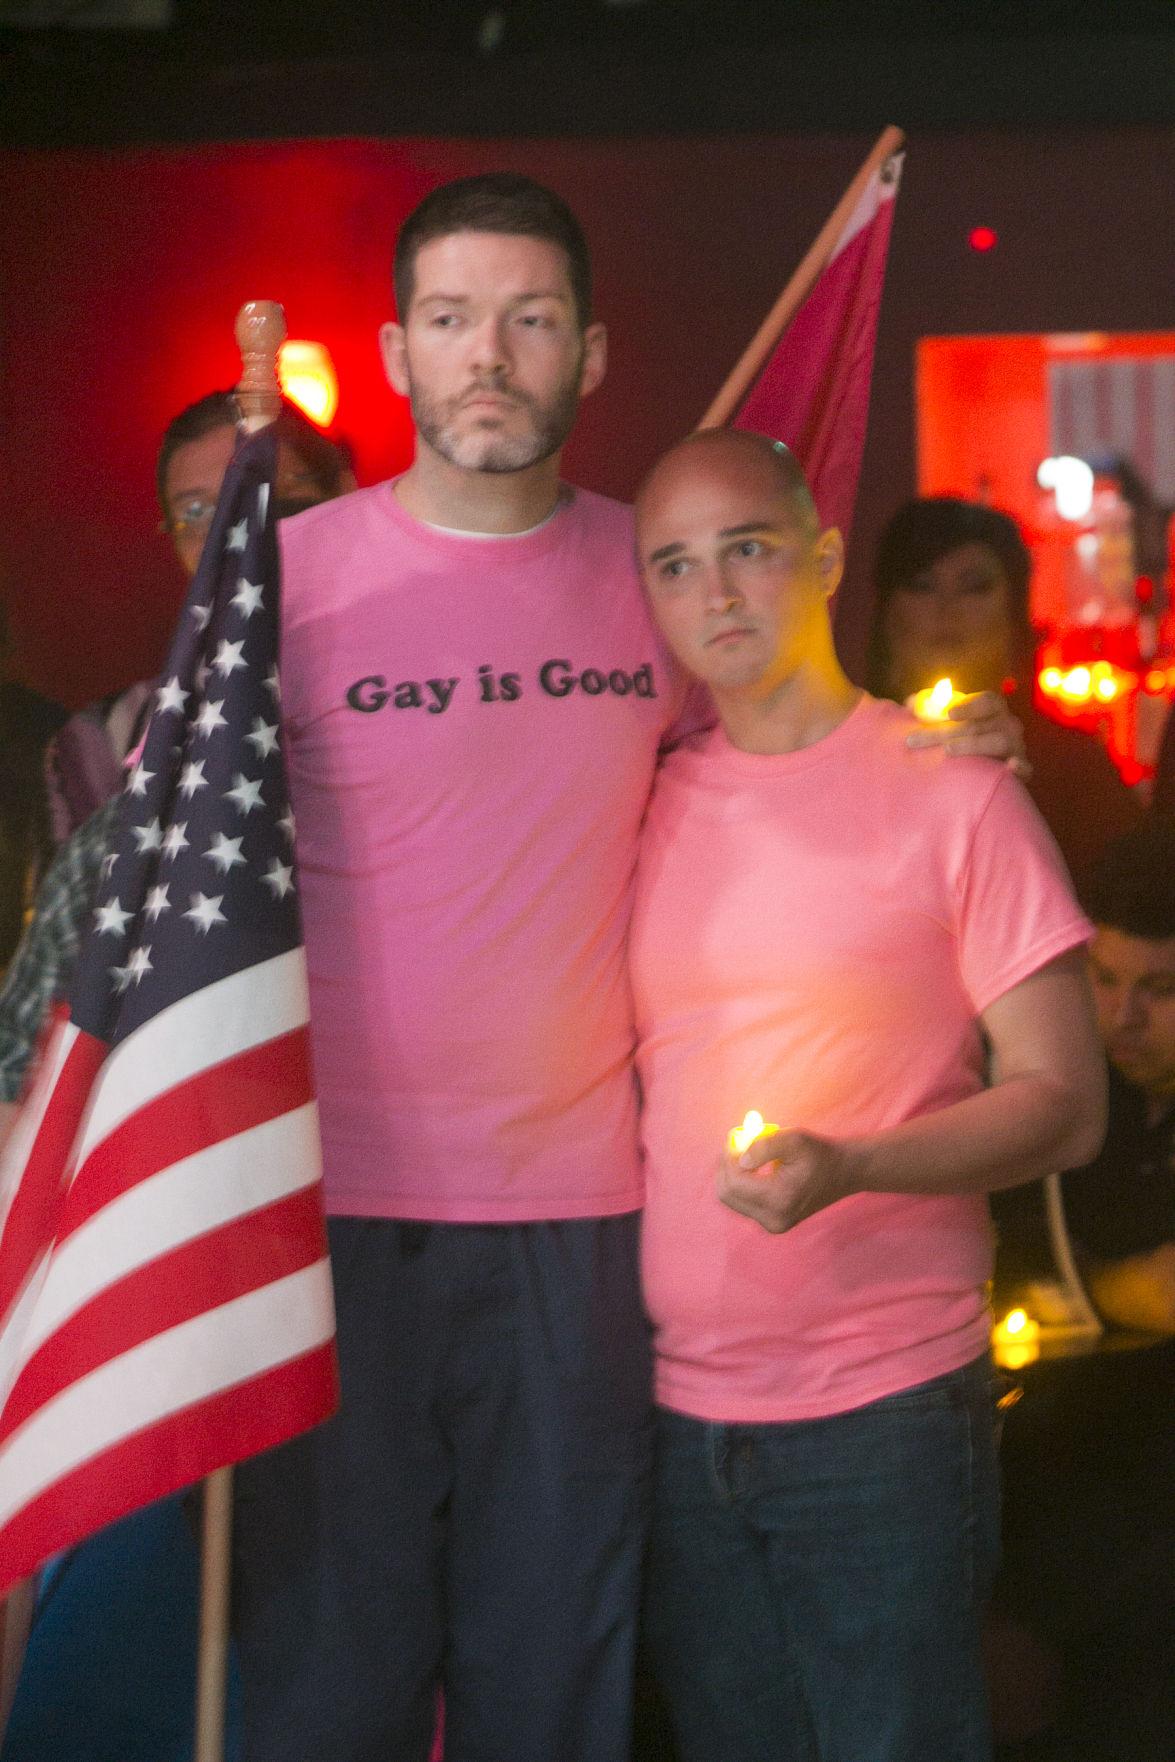 Peter north gay films